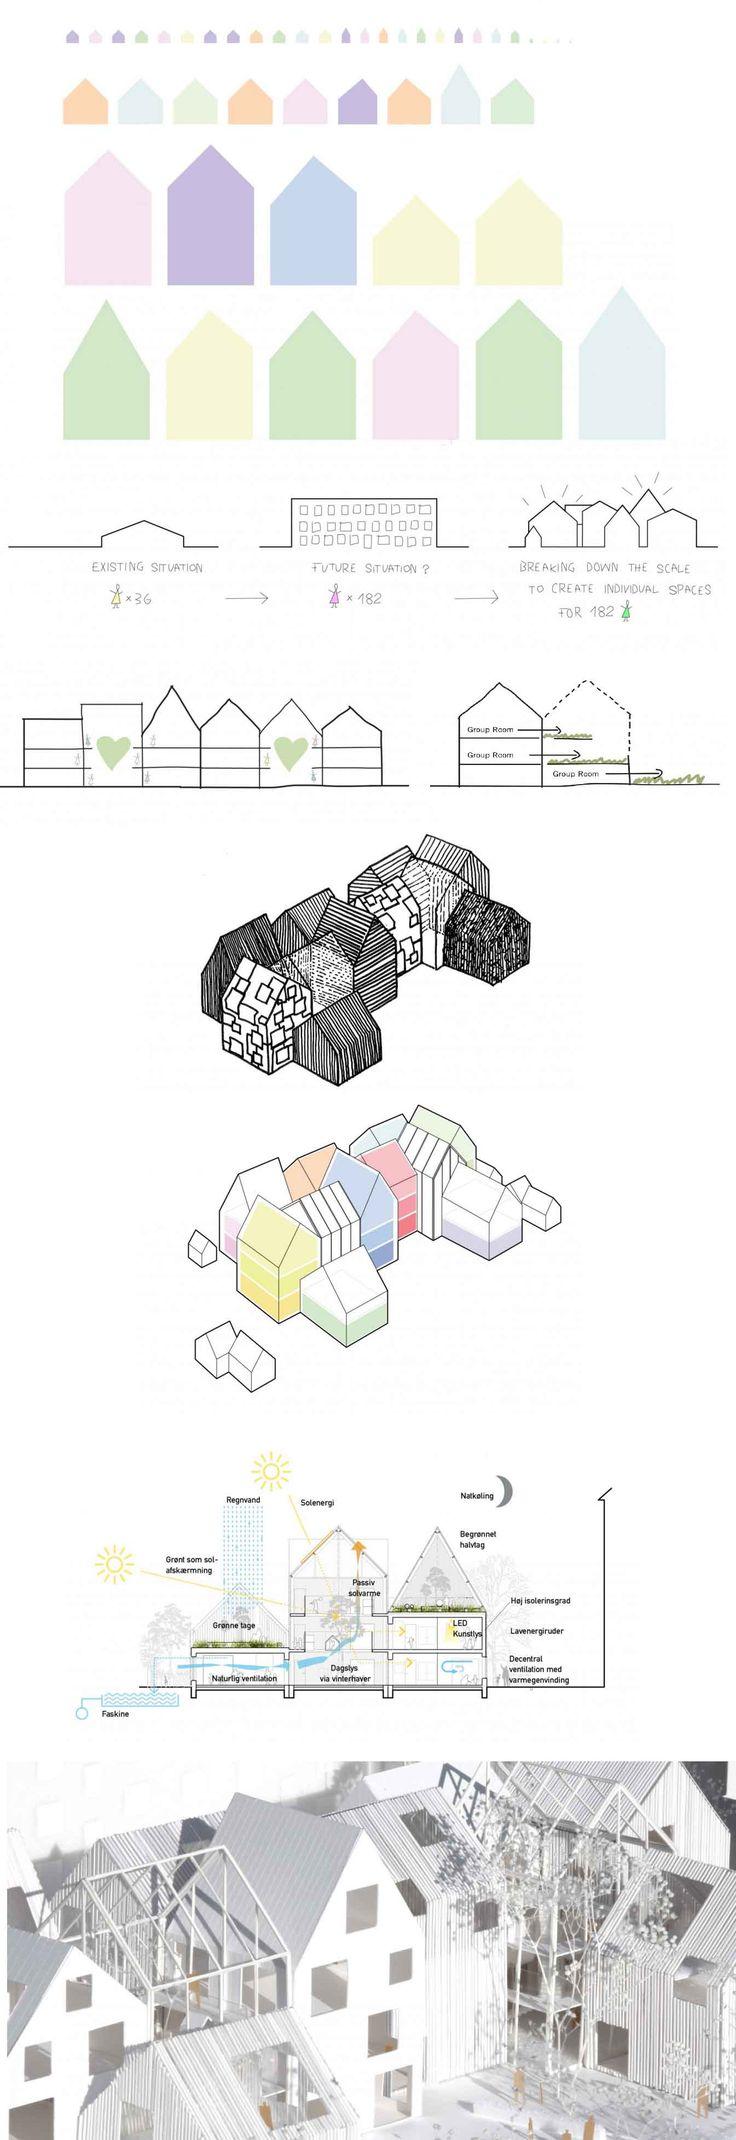 arquitectura-guarderia-inf.jpg (1345×3911)